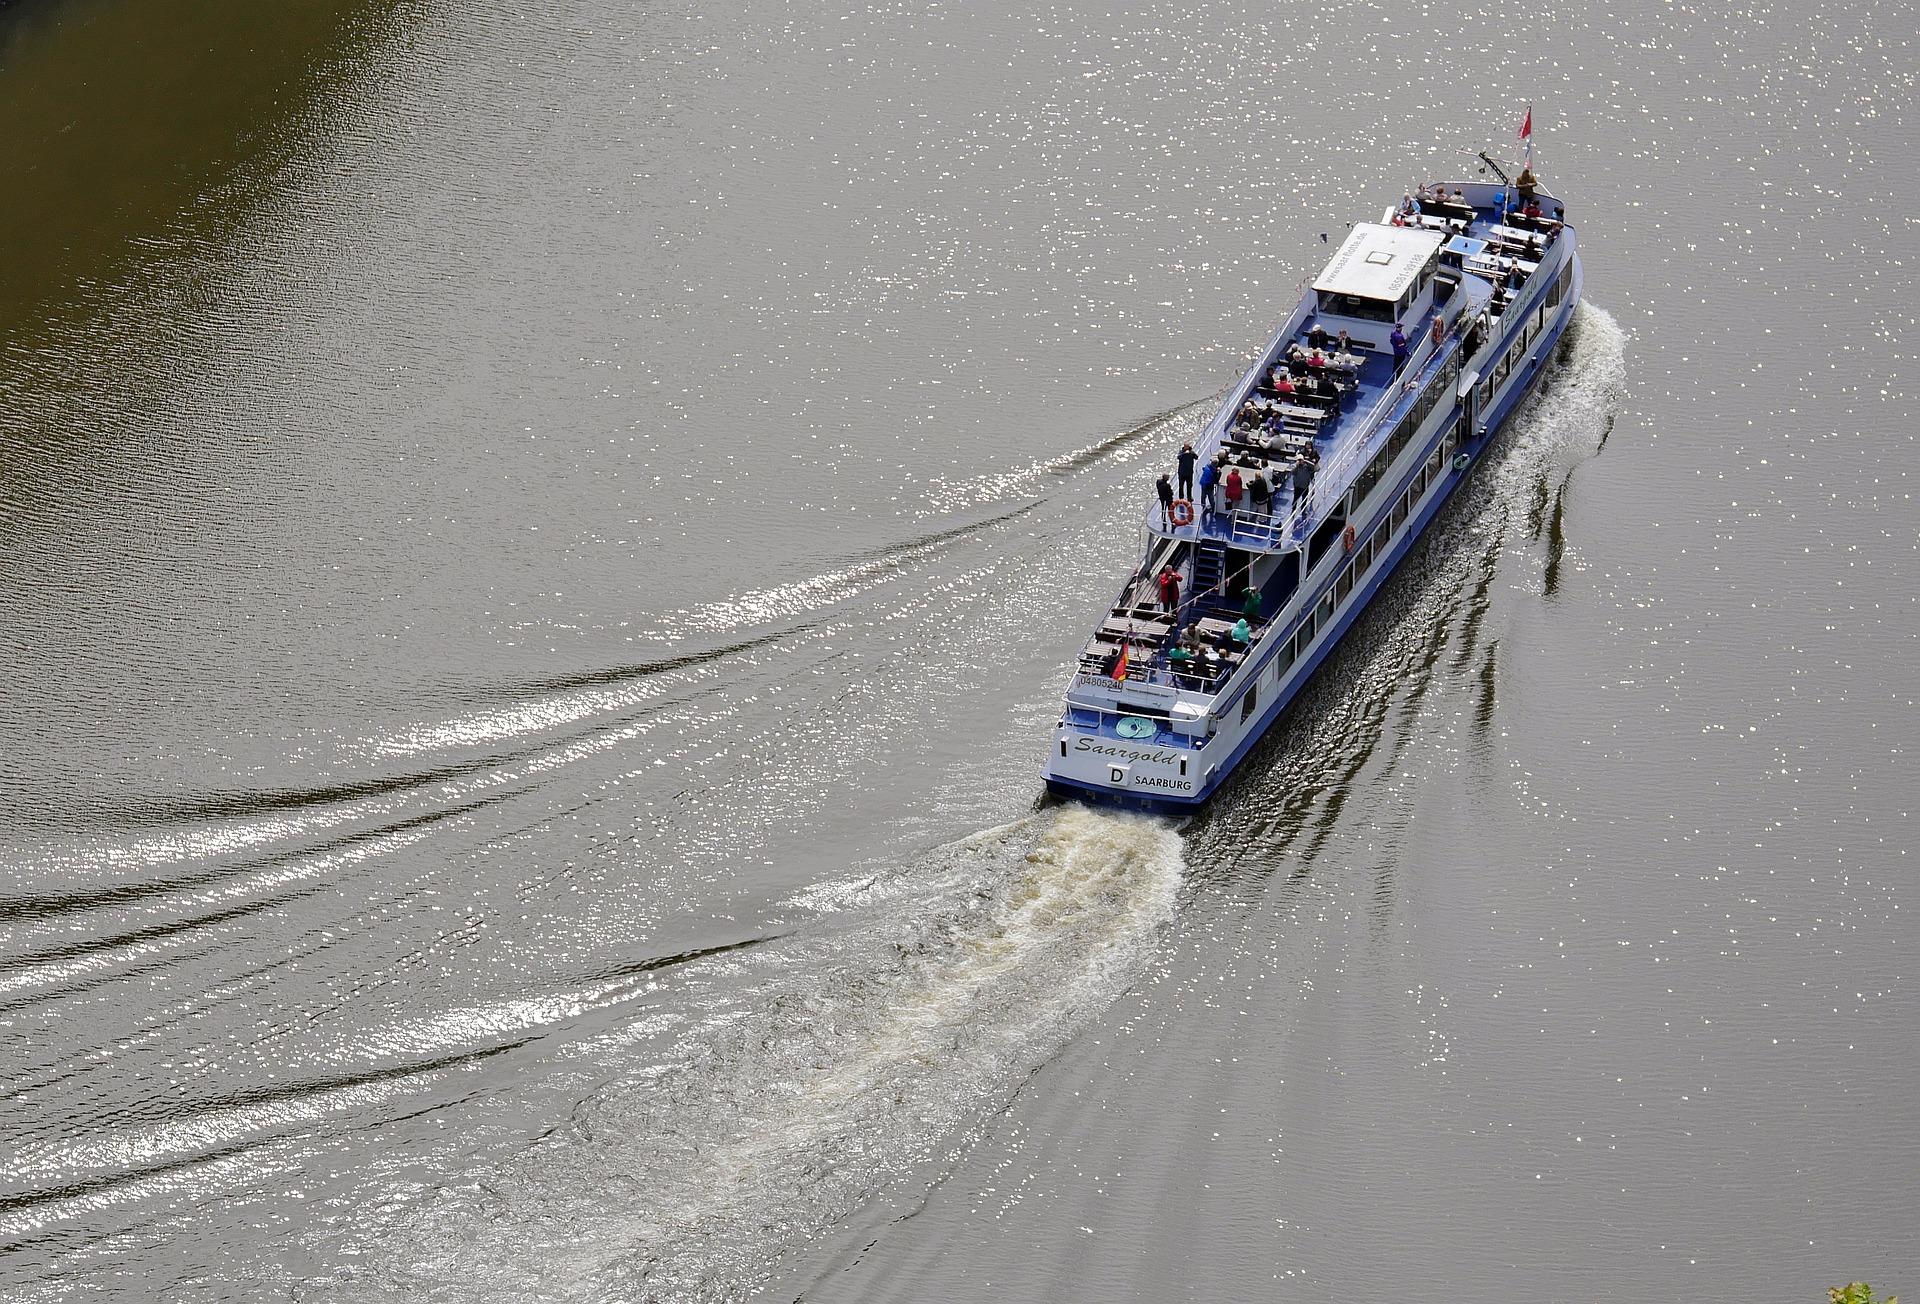 中禅寺湖の遊覧船の所用時間